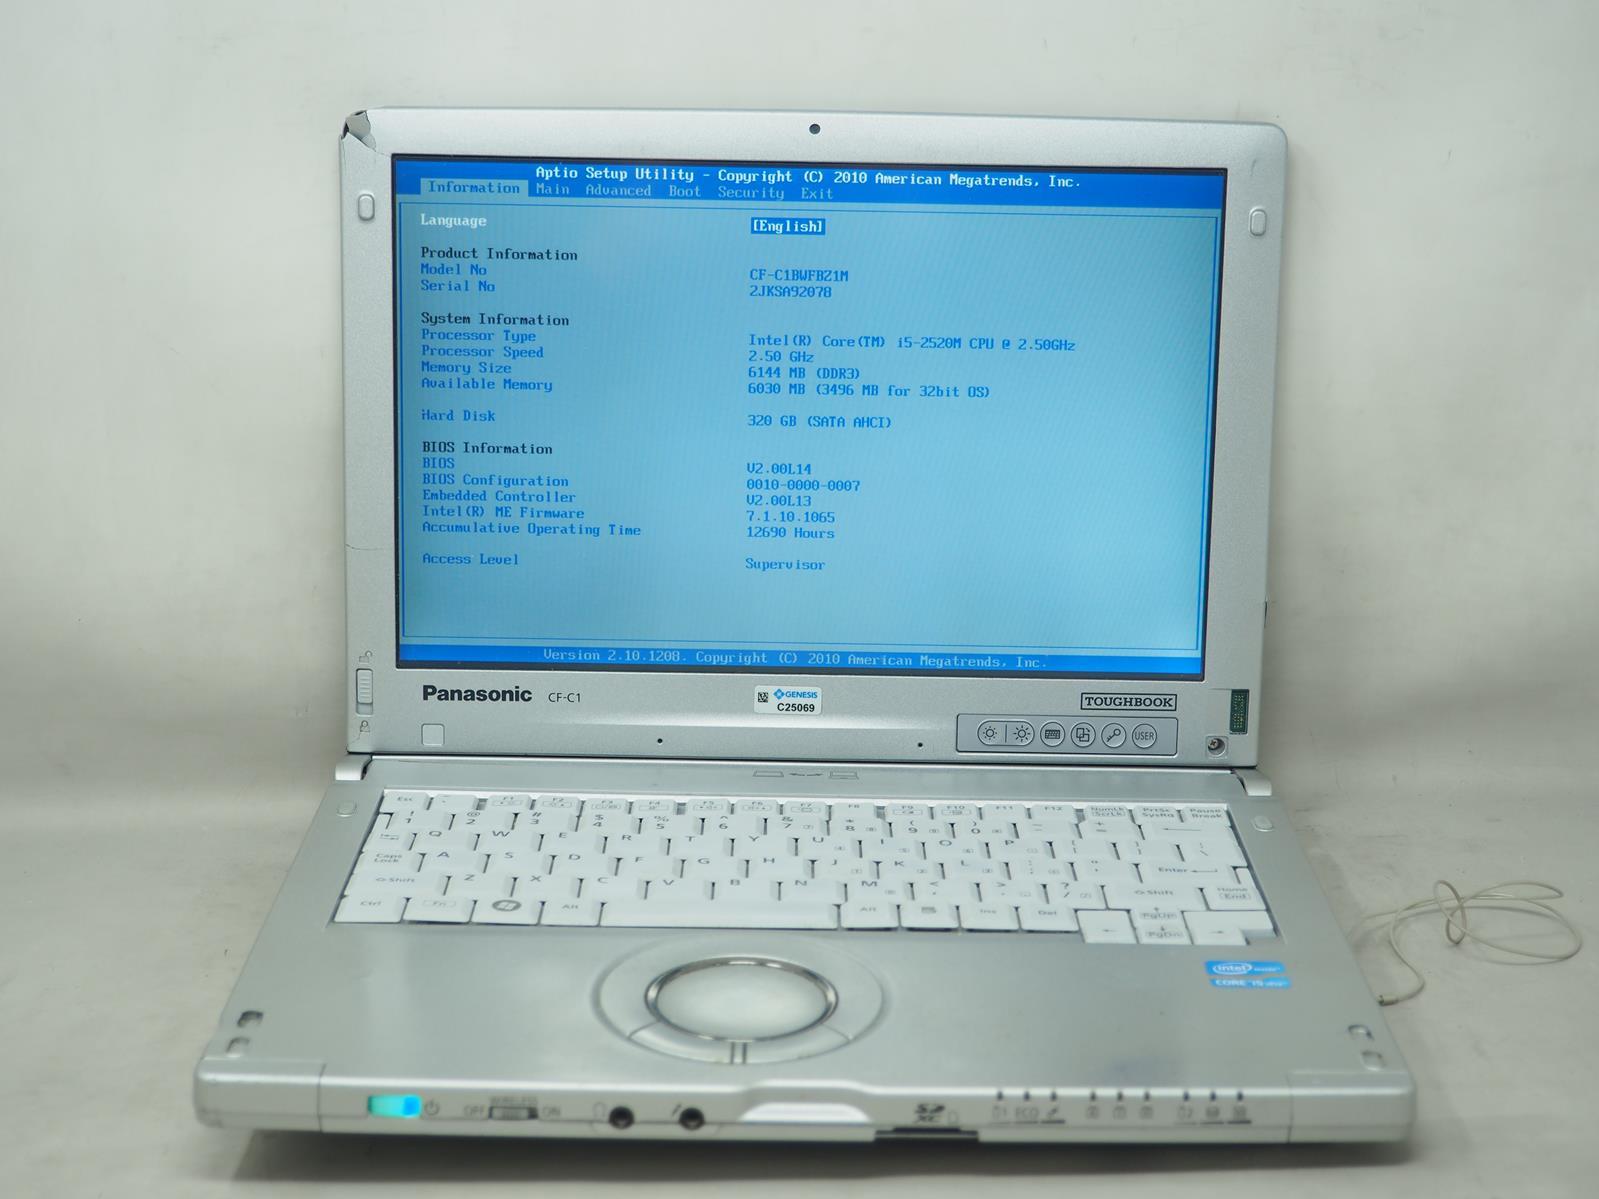 "PANASONIC TOUGHBOOK CF-C1 12.1"" Laptop Intel i5-2520M 2.50GHz 6GB 320GB No OS"